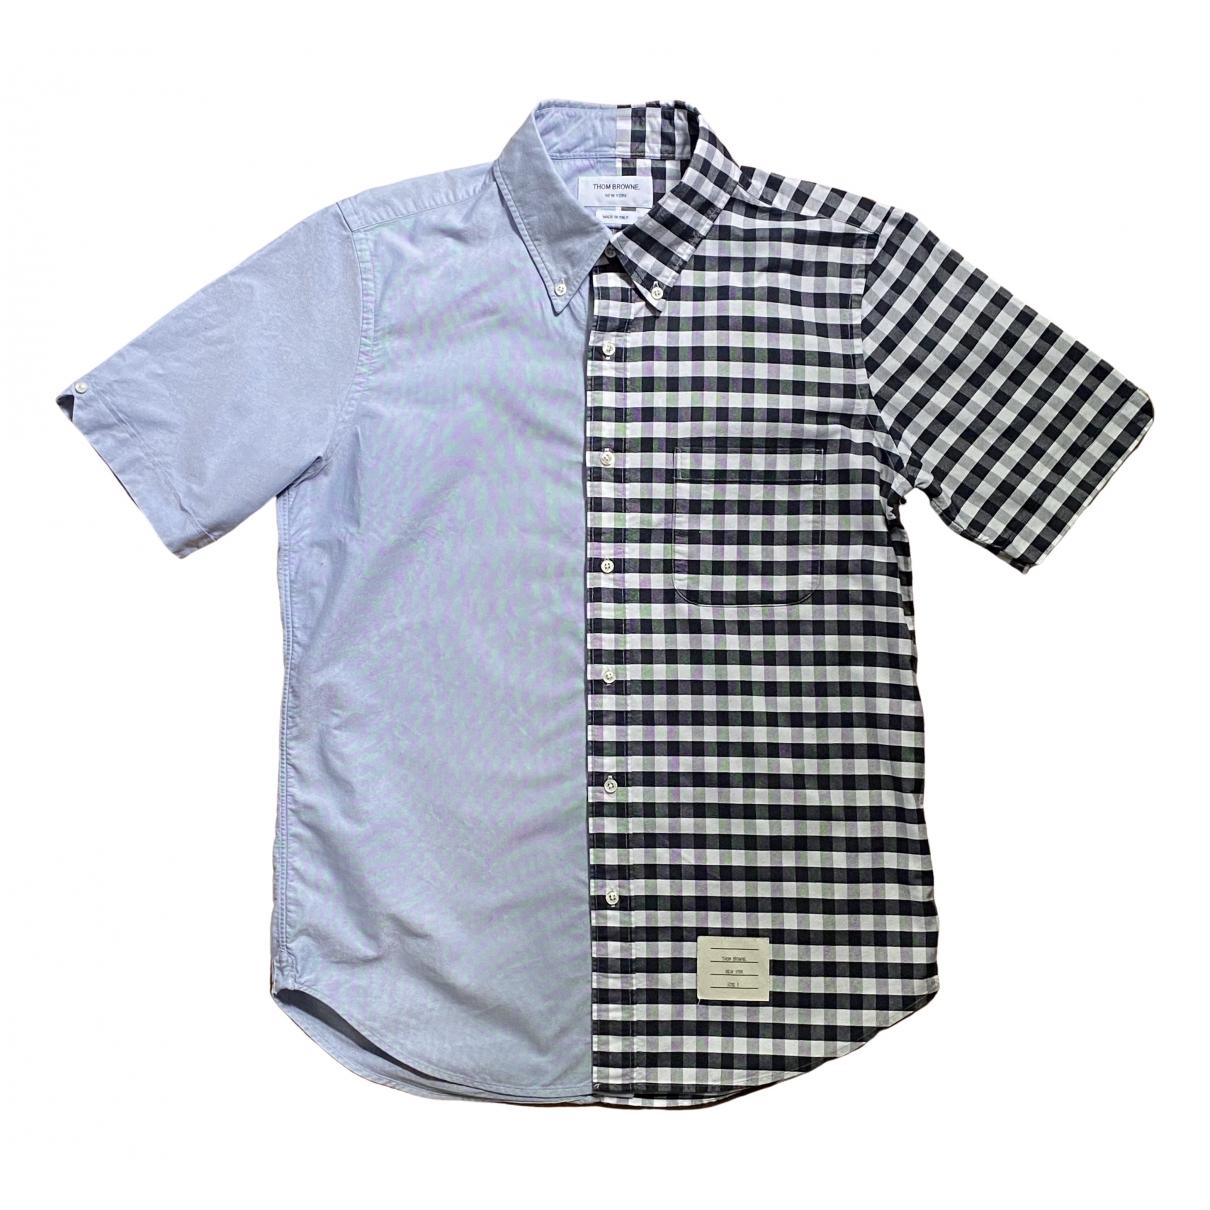 Thom Browne \N Blue Cotton Shirts for Men M International